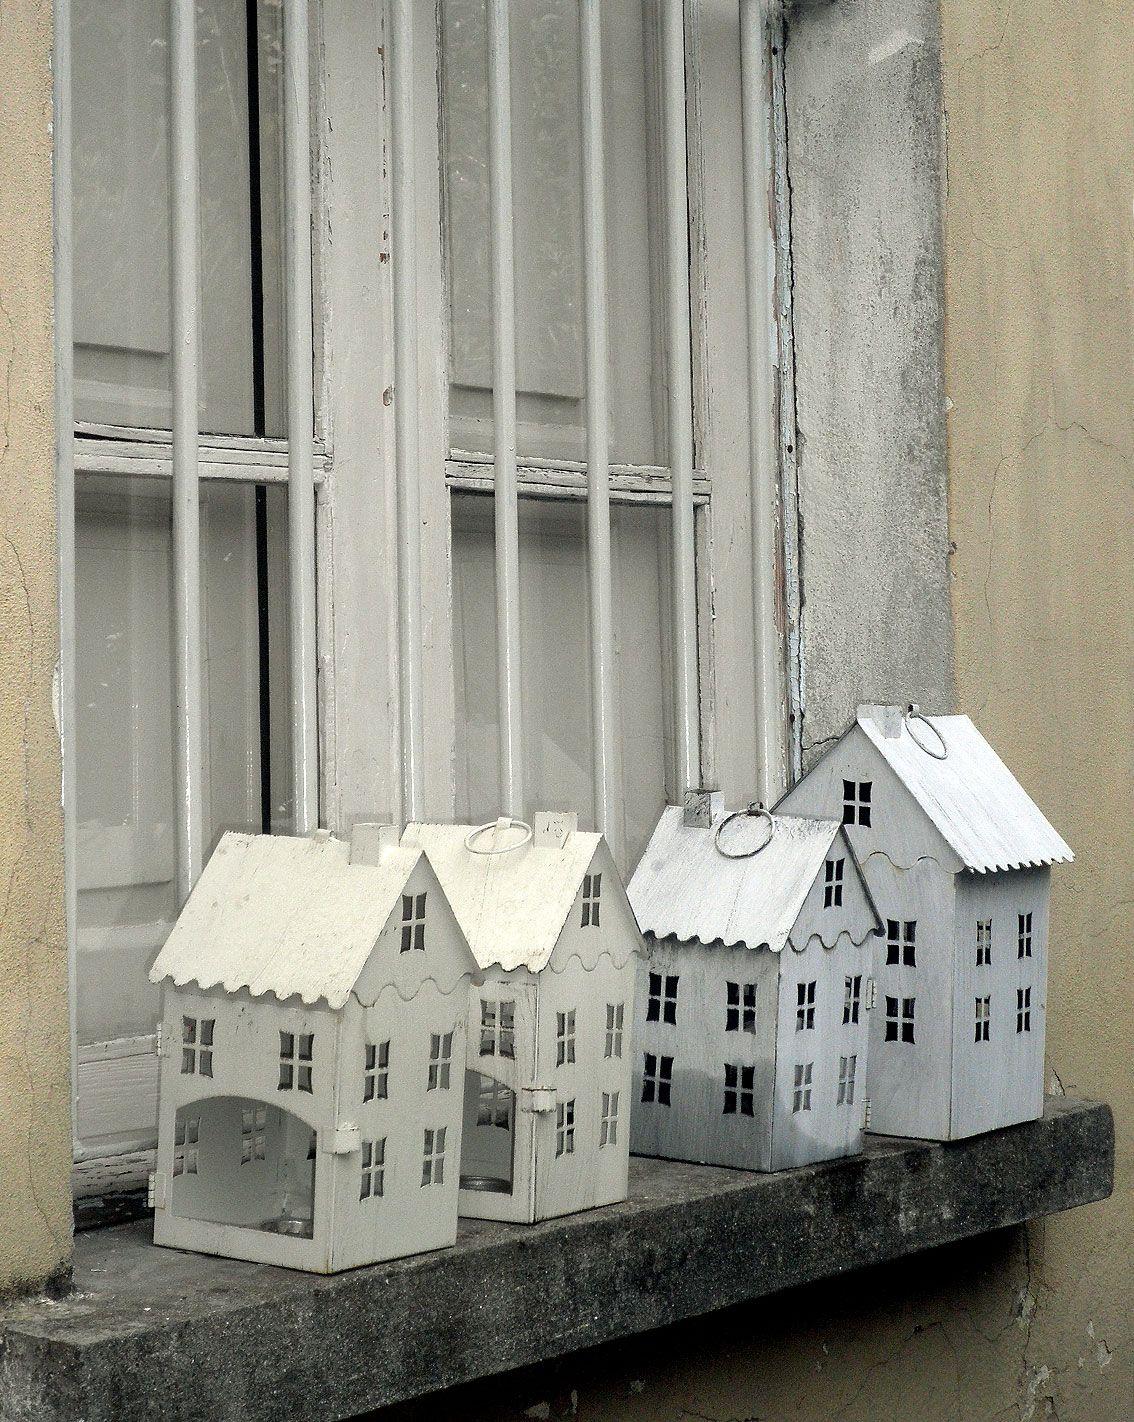 I love little houses mikapoka pics inspiration pinterest i love little houses mikapoka pics jeuxipadfo Image collections